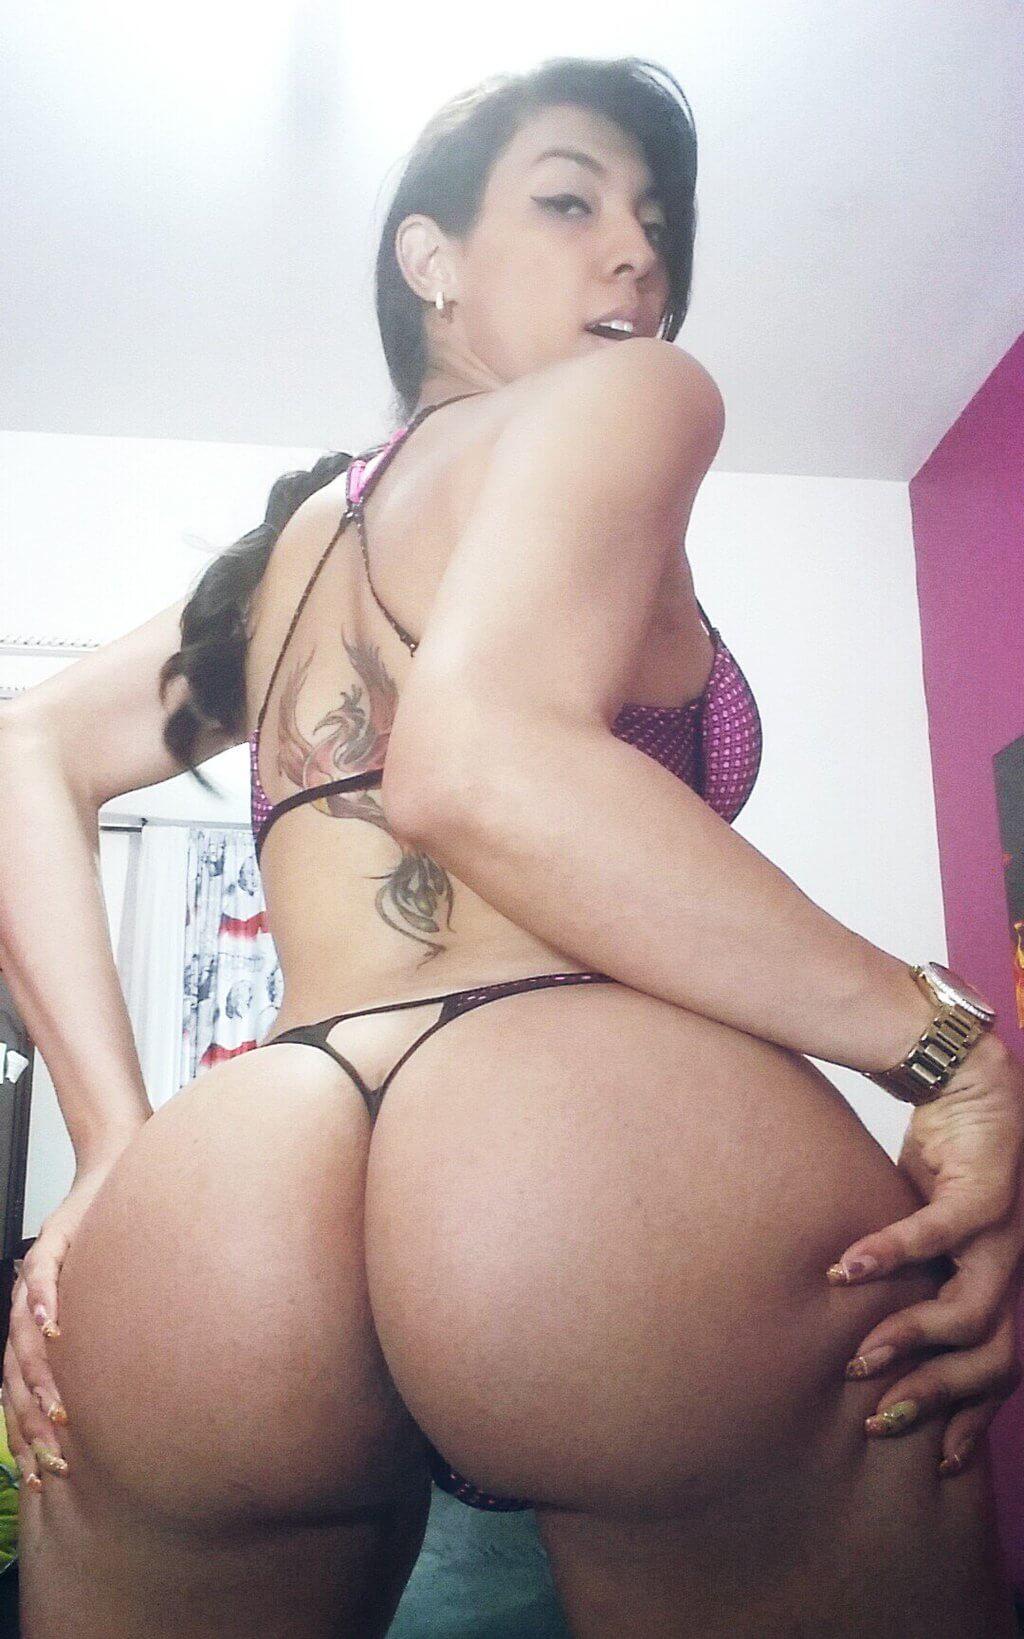 anal Colombiana de Culo Grande fucks friend